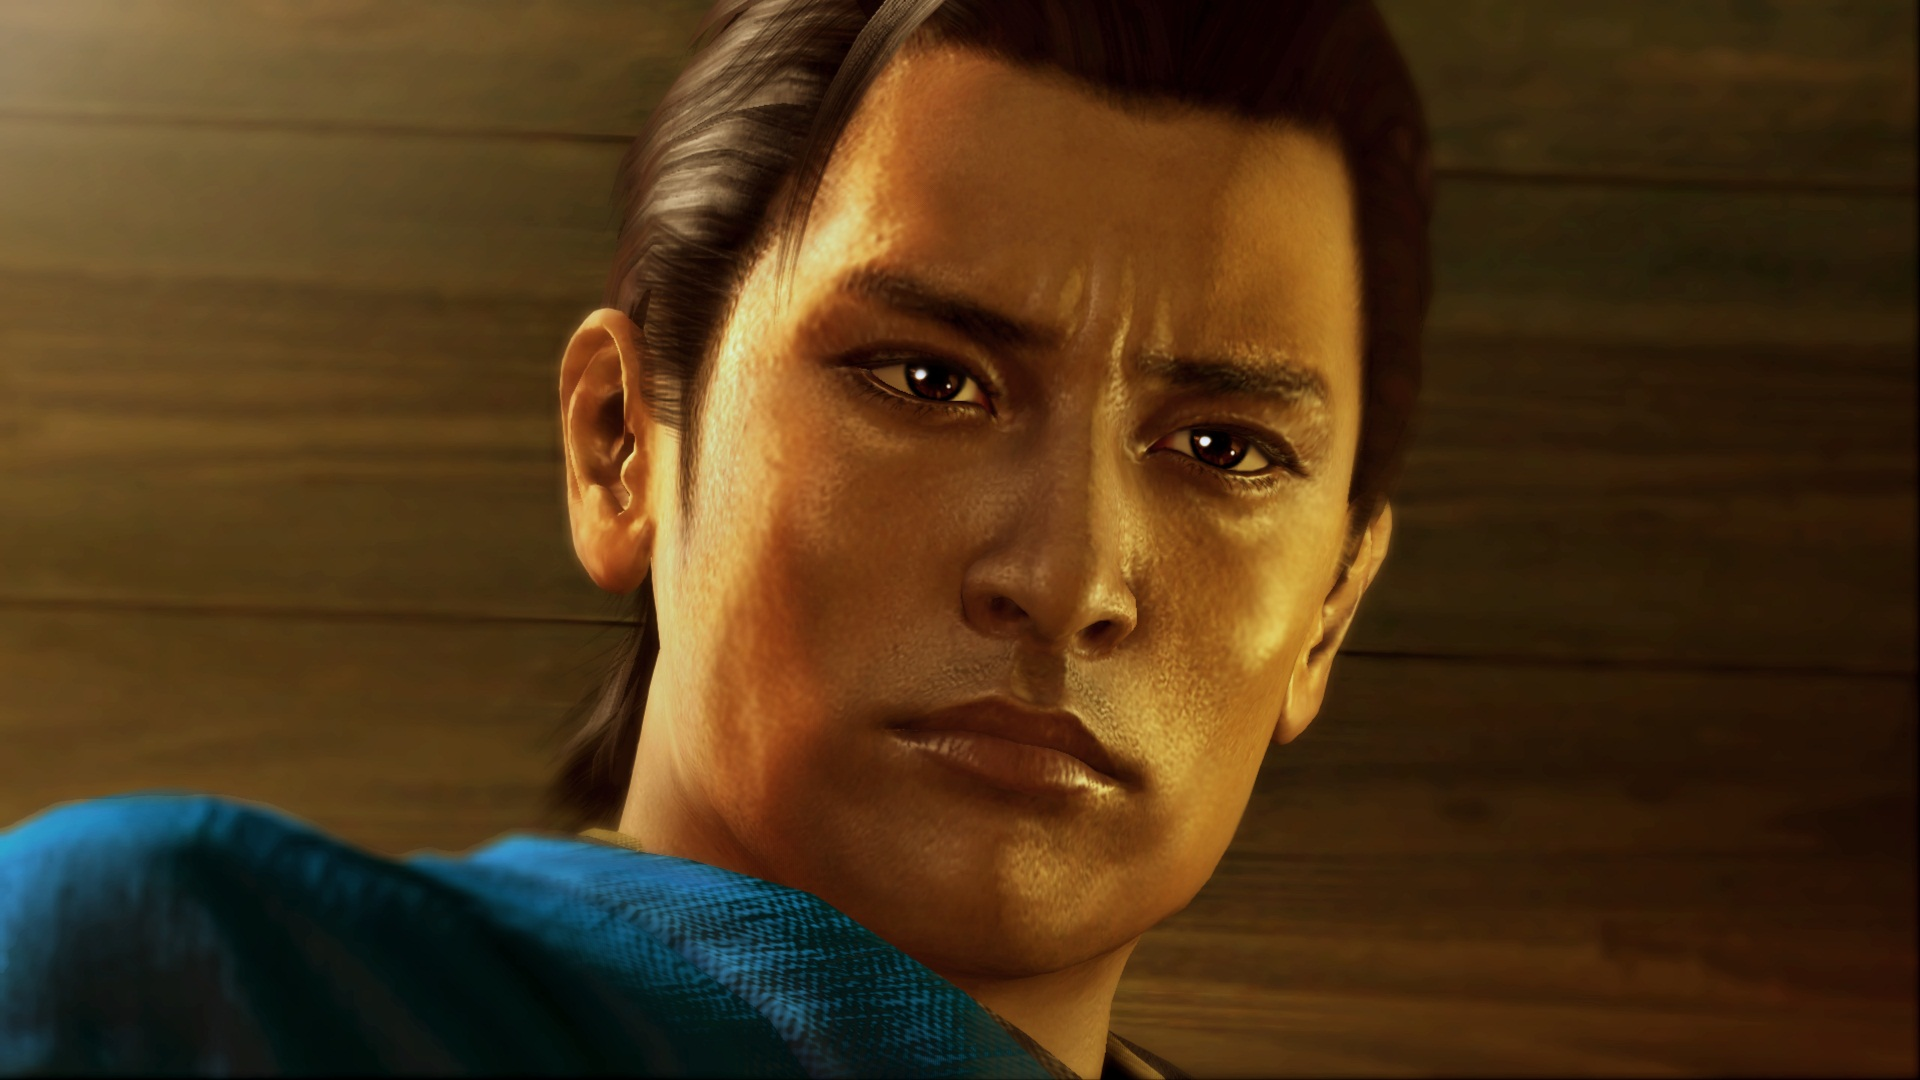 Yakuza Ishin dostala na TGS trailery a obrázky 87958